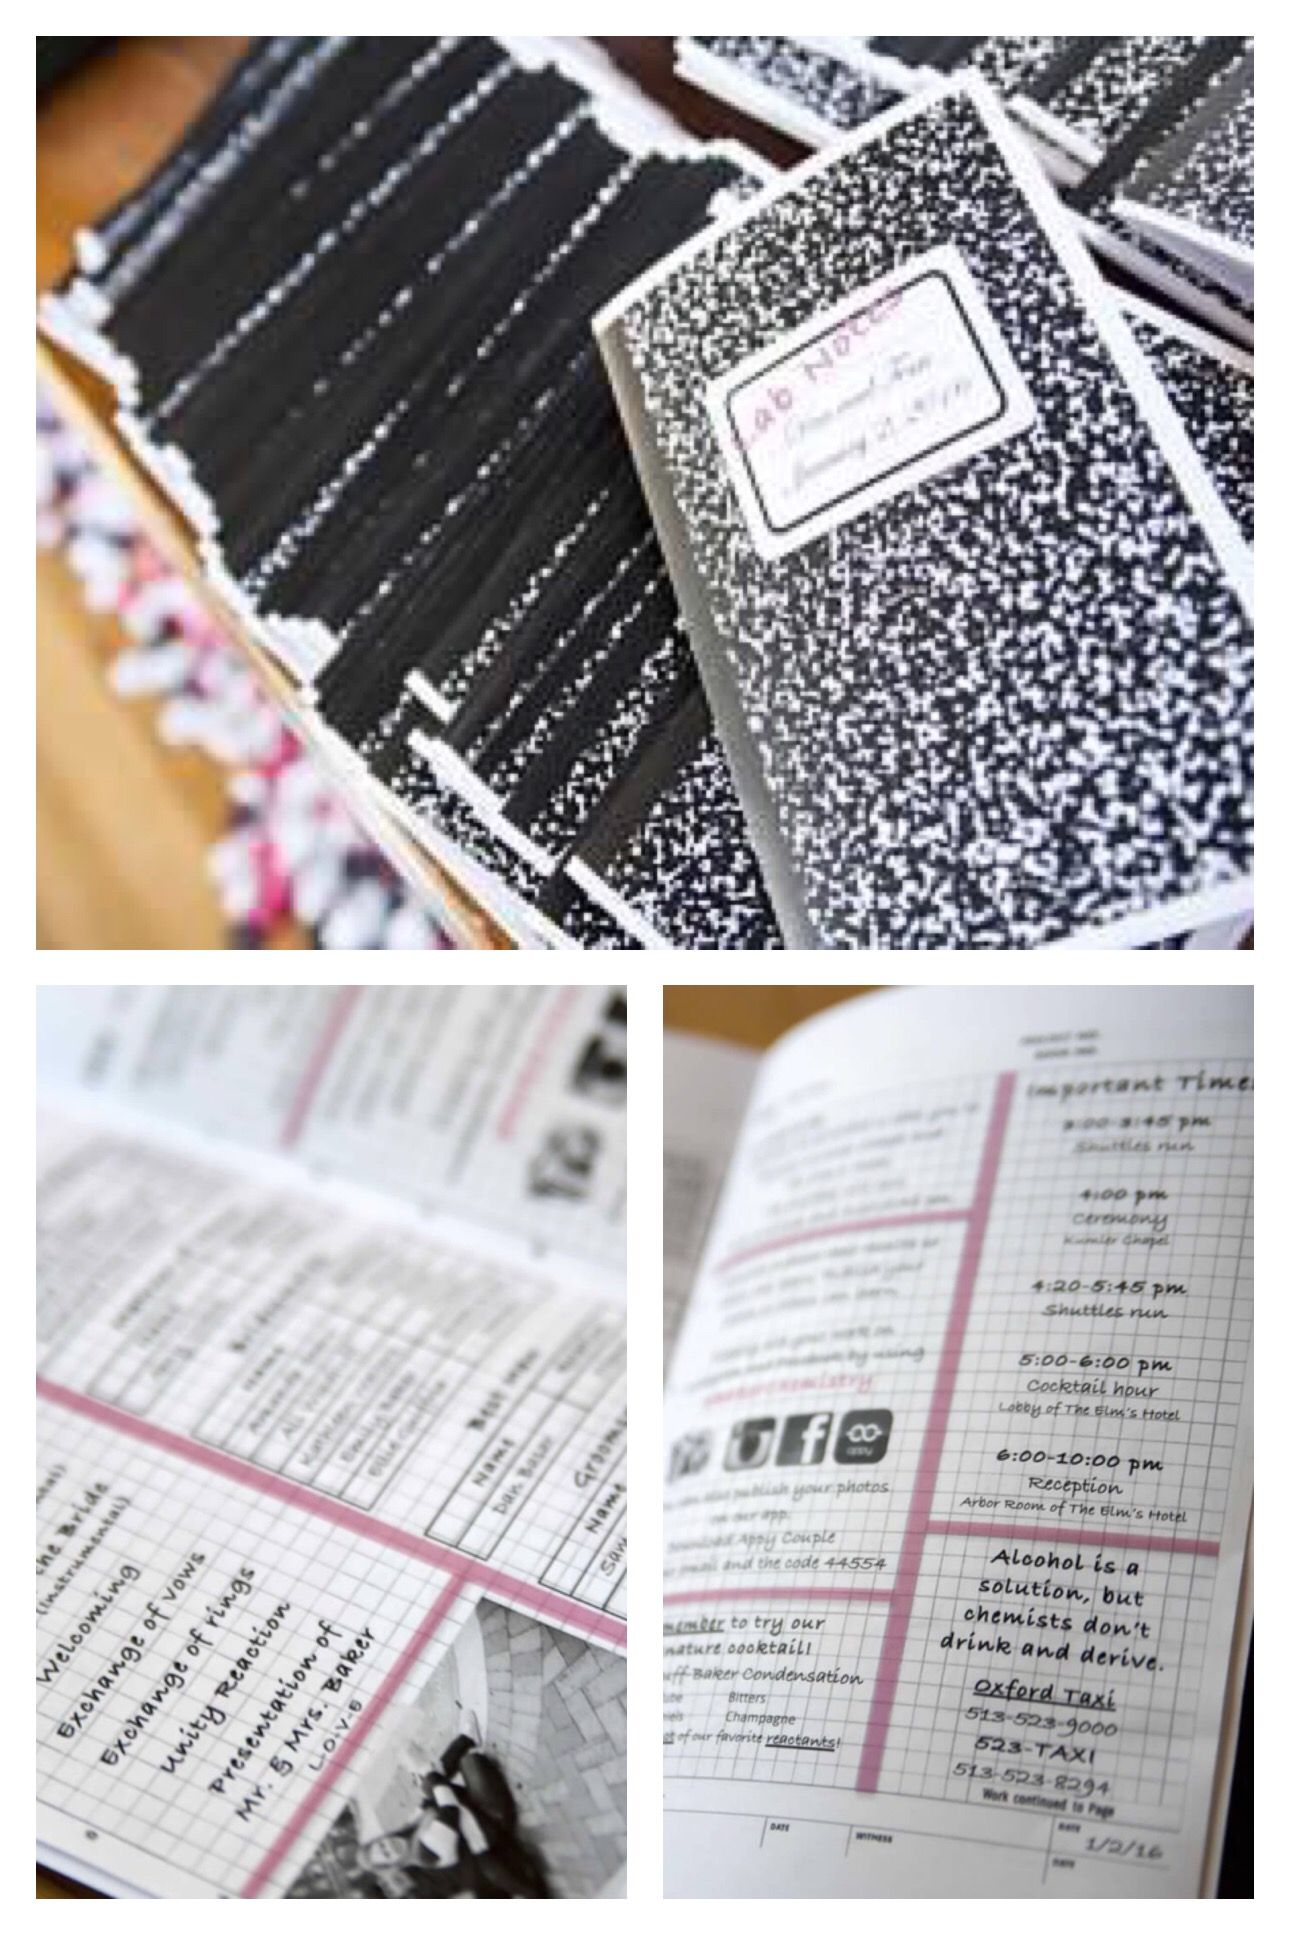 Lab notebook themed wedding programs. Chemistry wedding. | Wedding ...